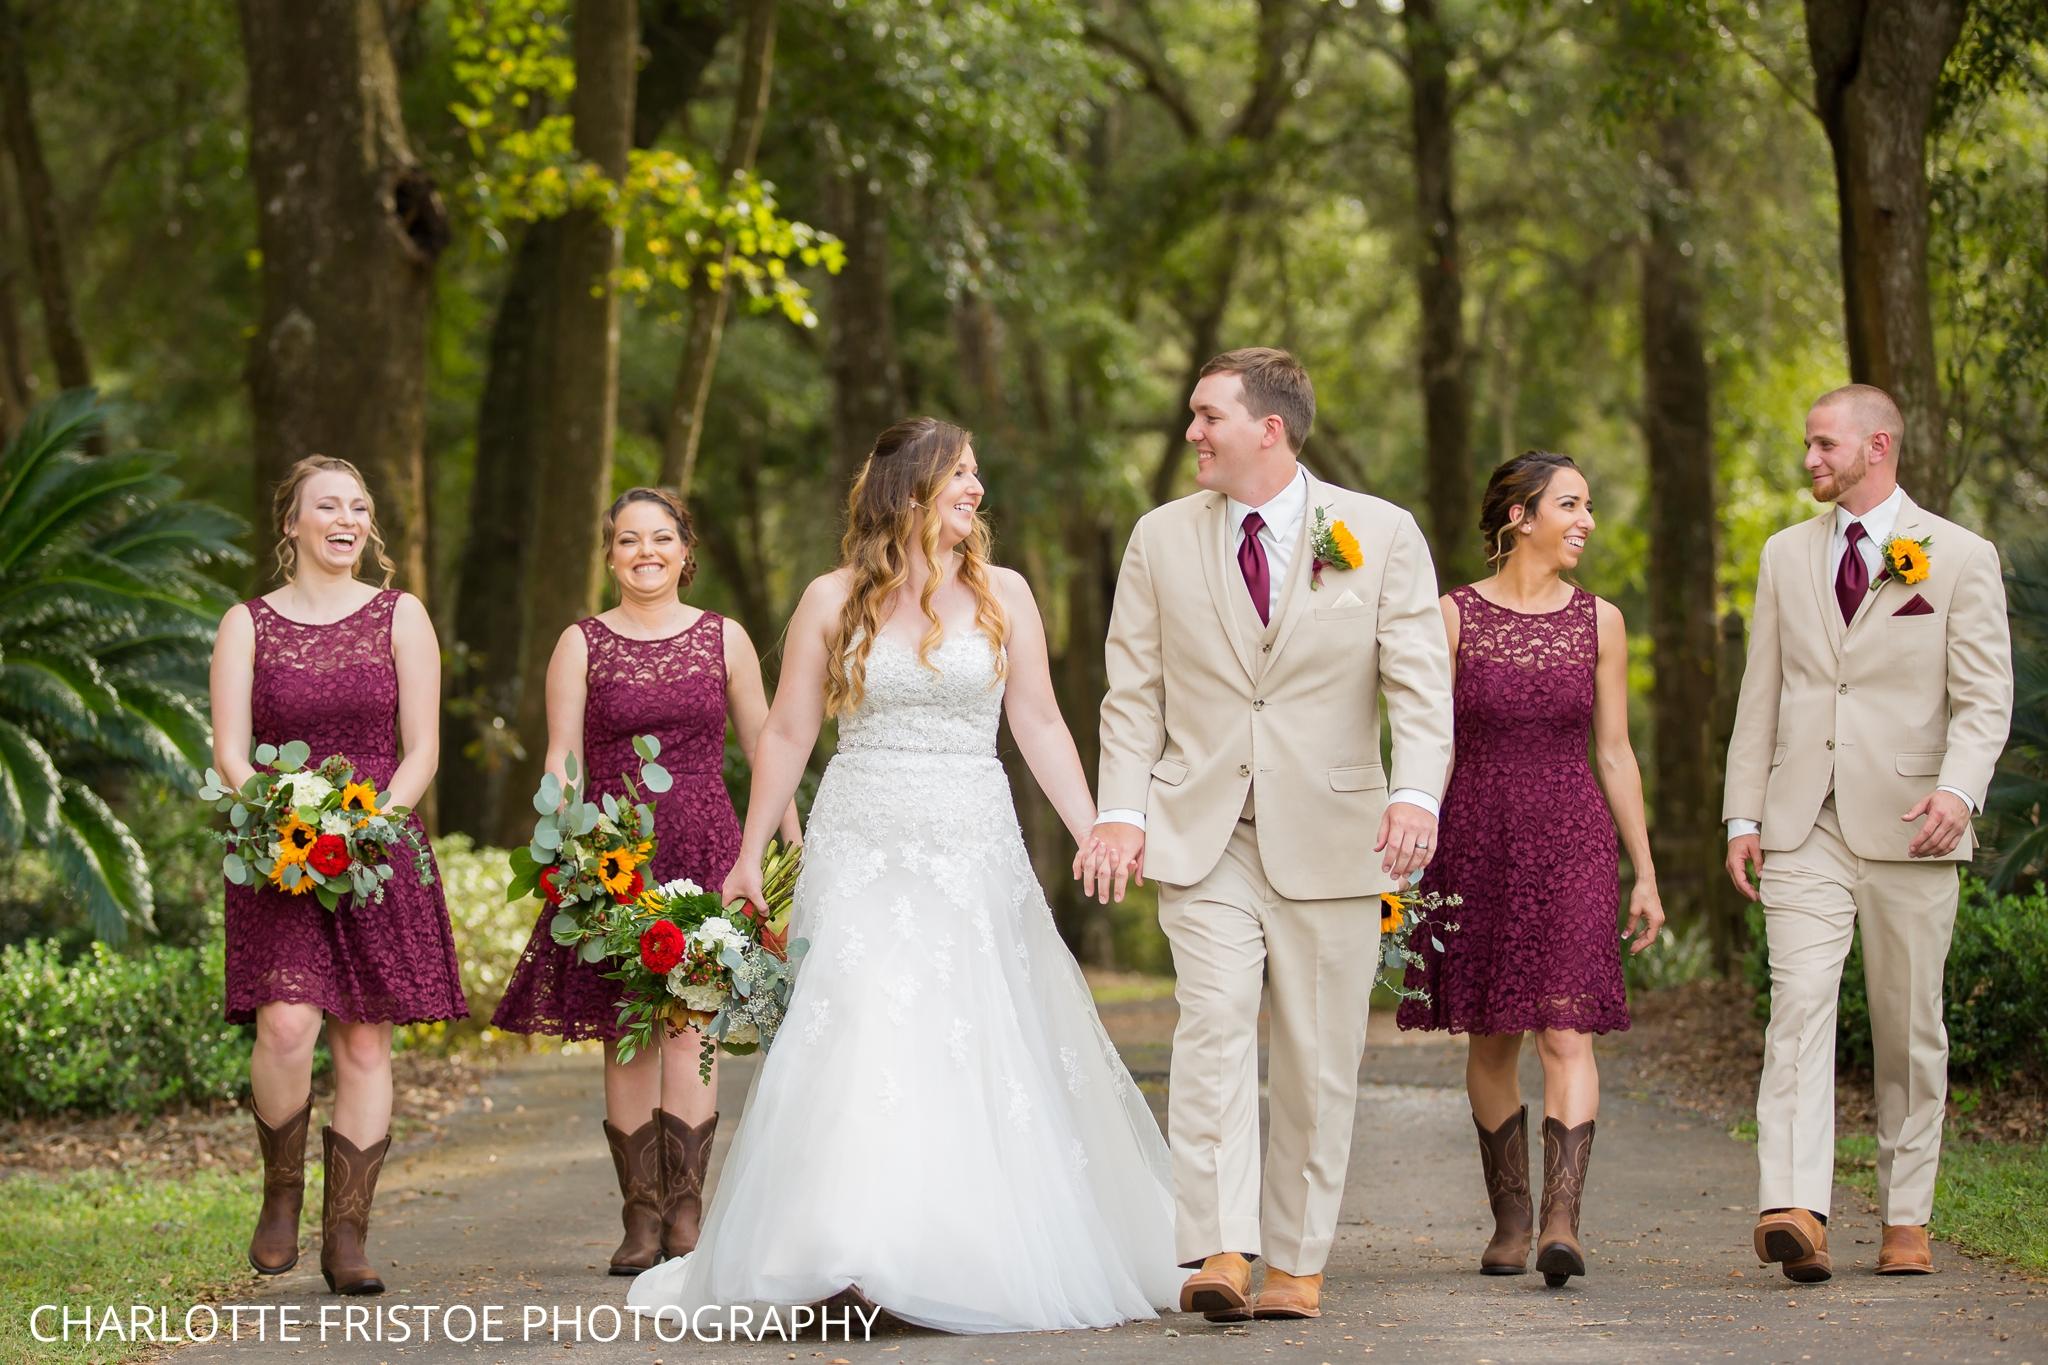 Tallahassee_Wedding_Charlotte_Fristoe-42.jpg